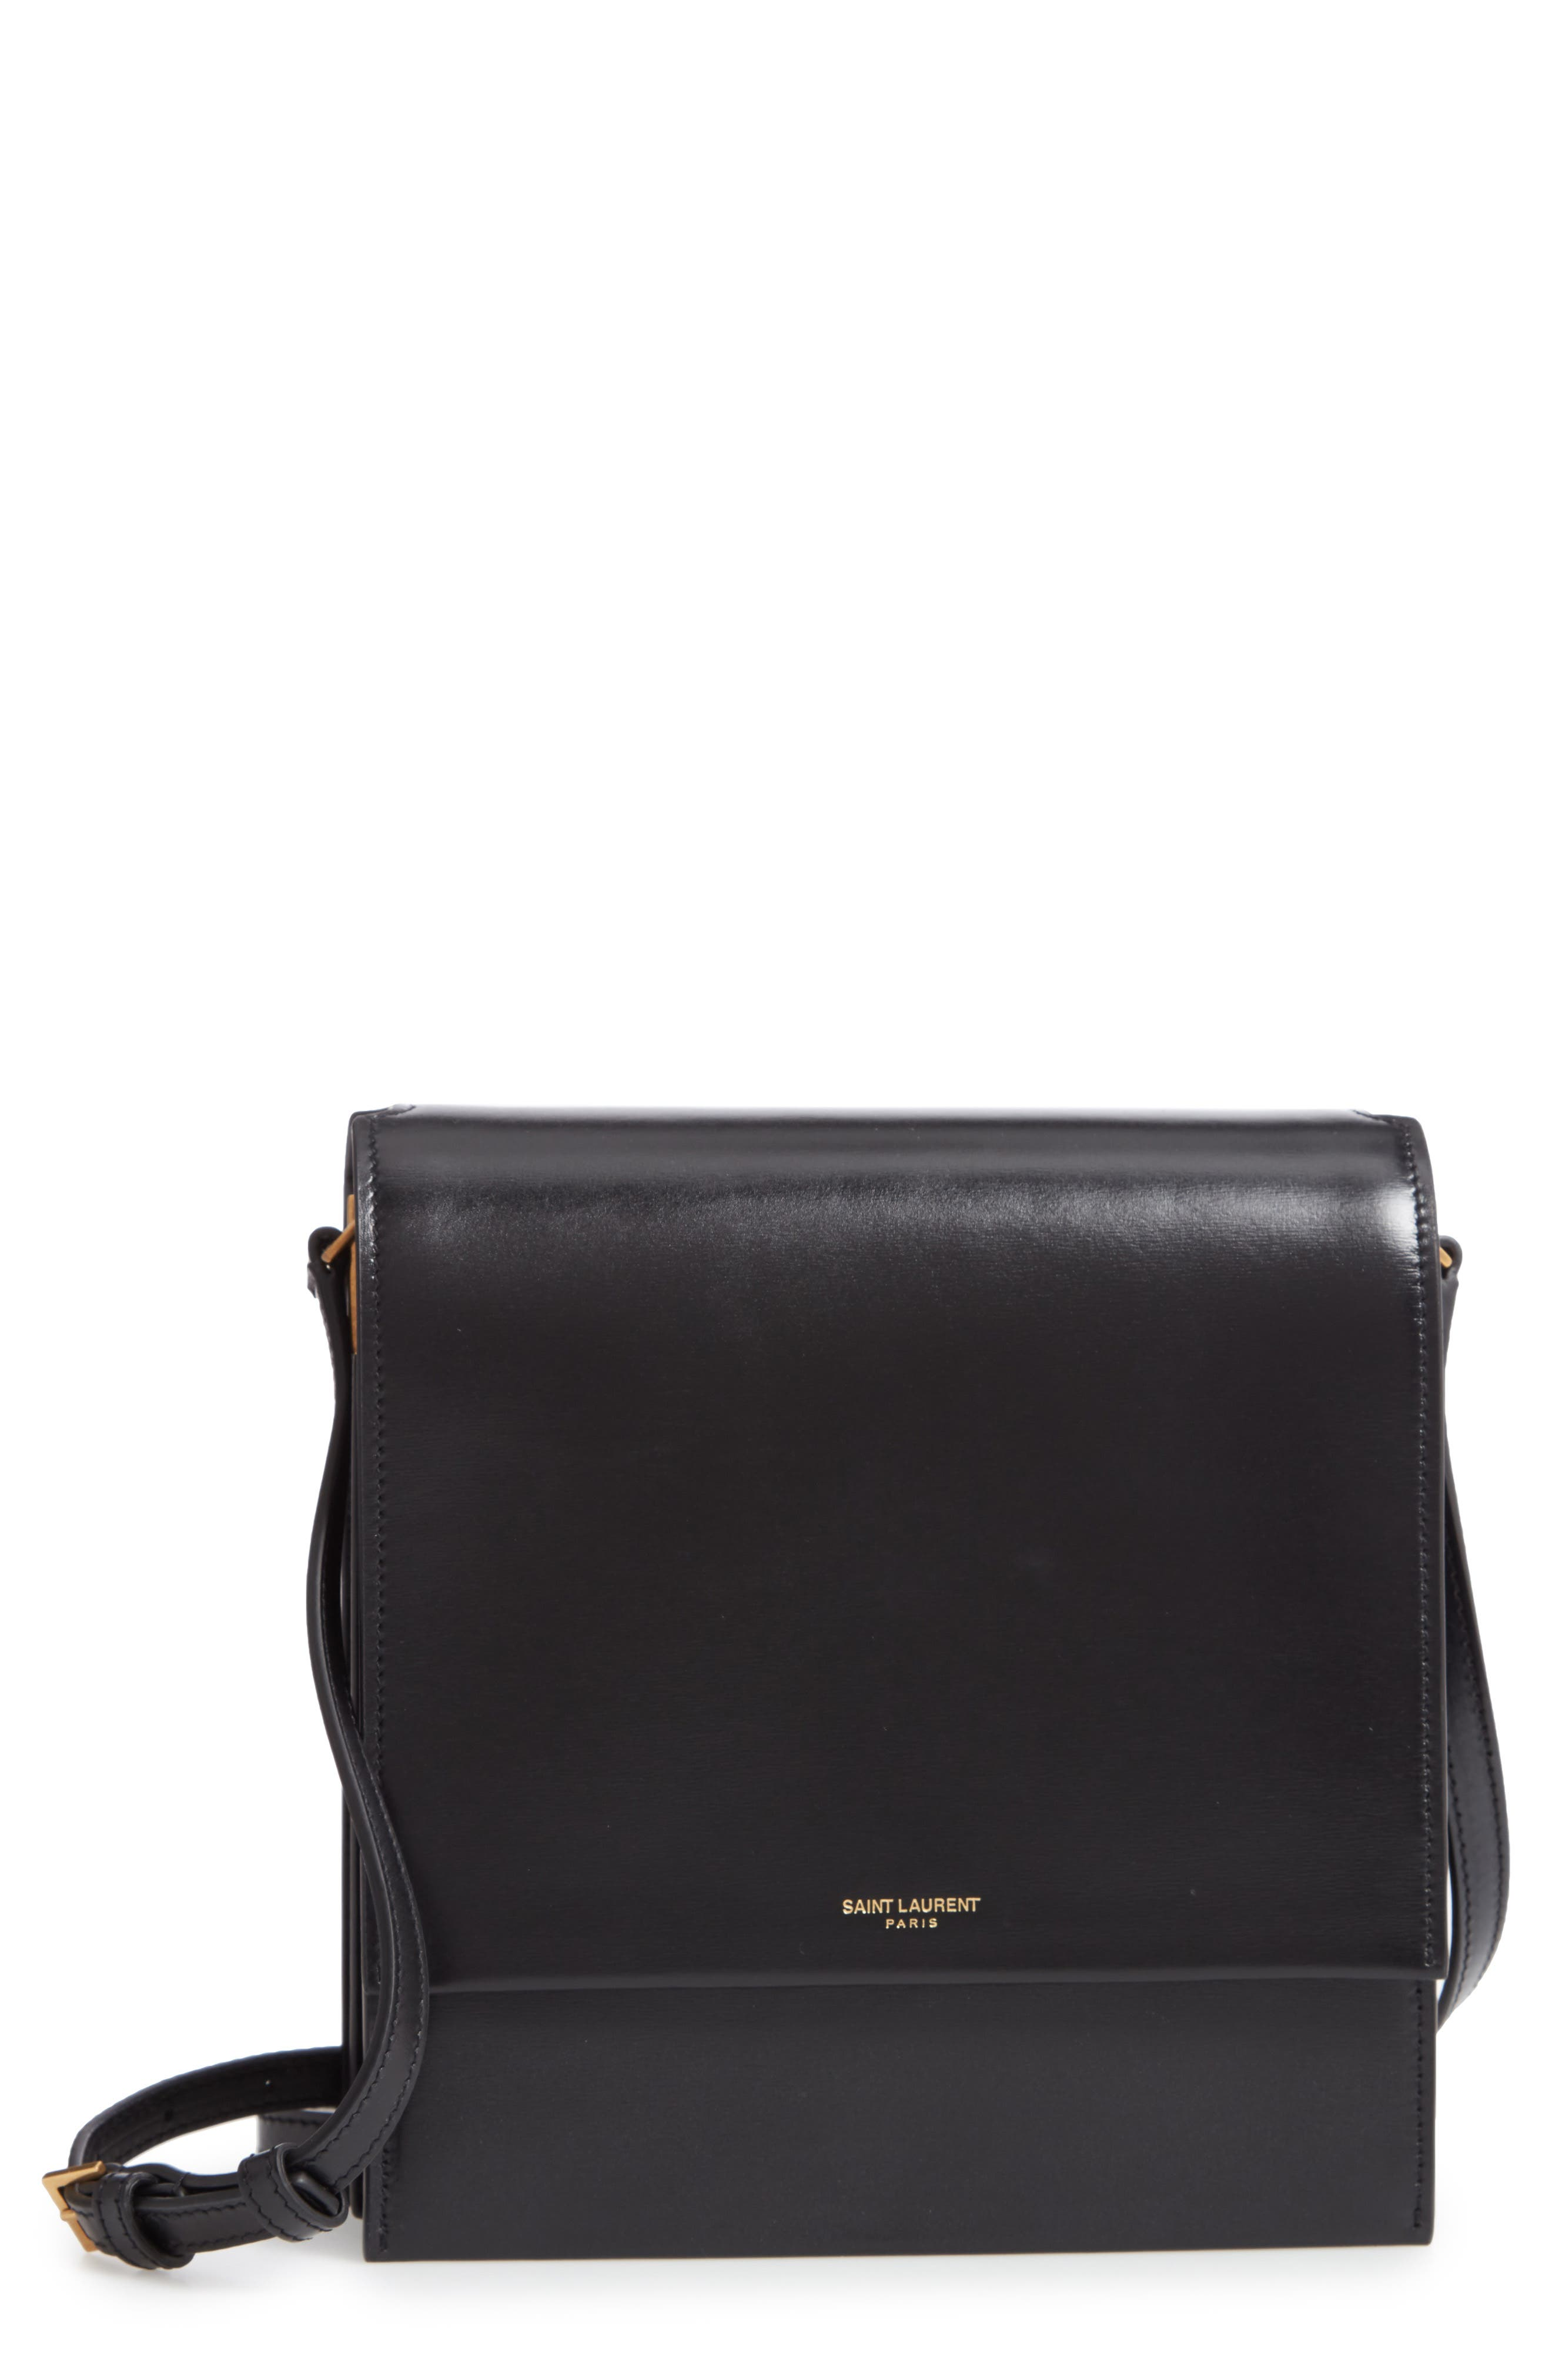 Sao Leather Shoulder Bag,                         Main,                         color, NOIR